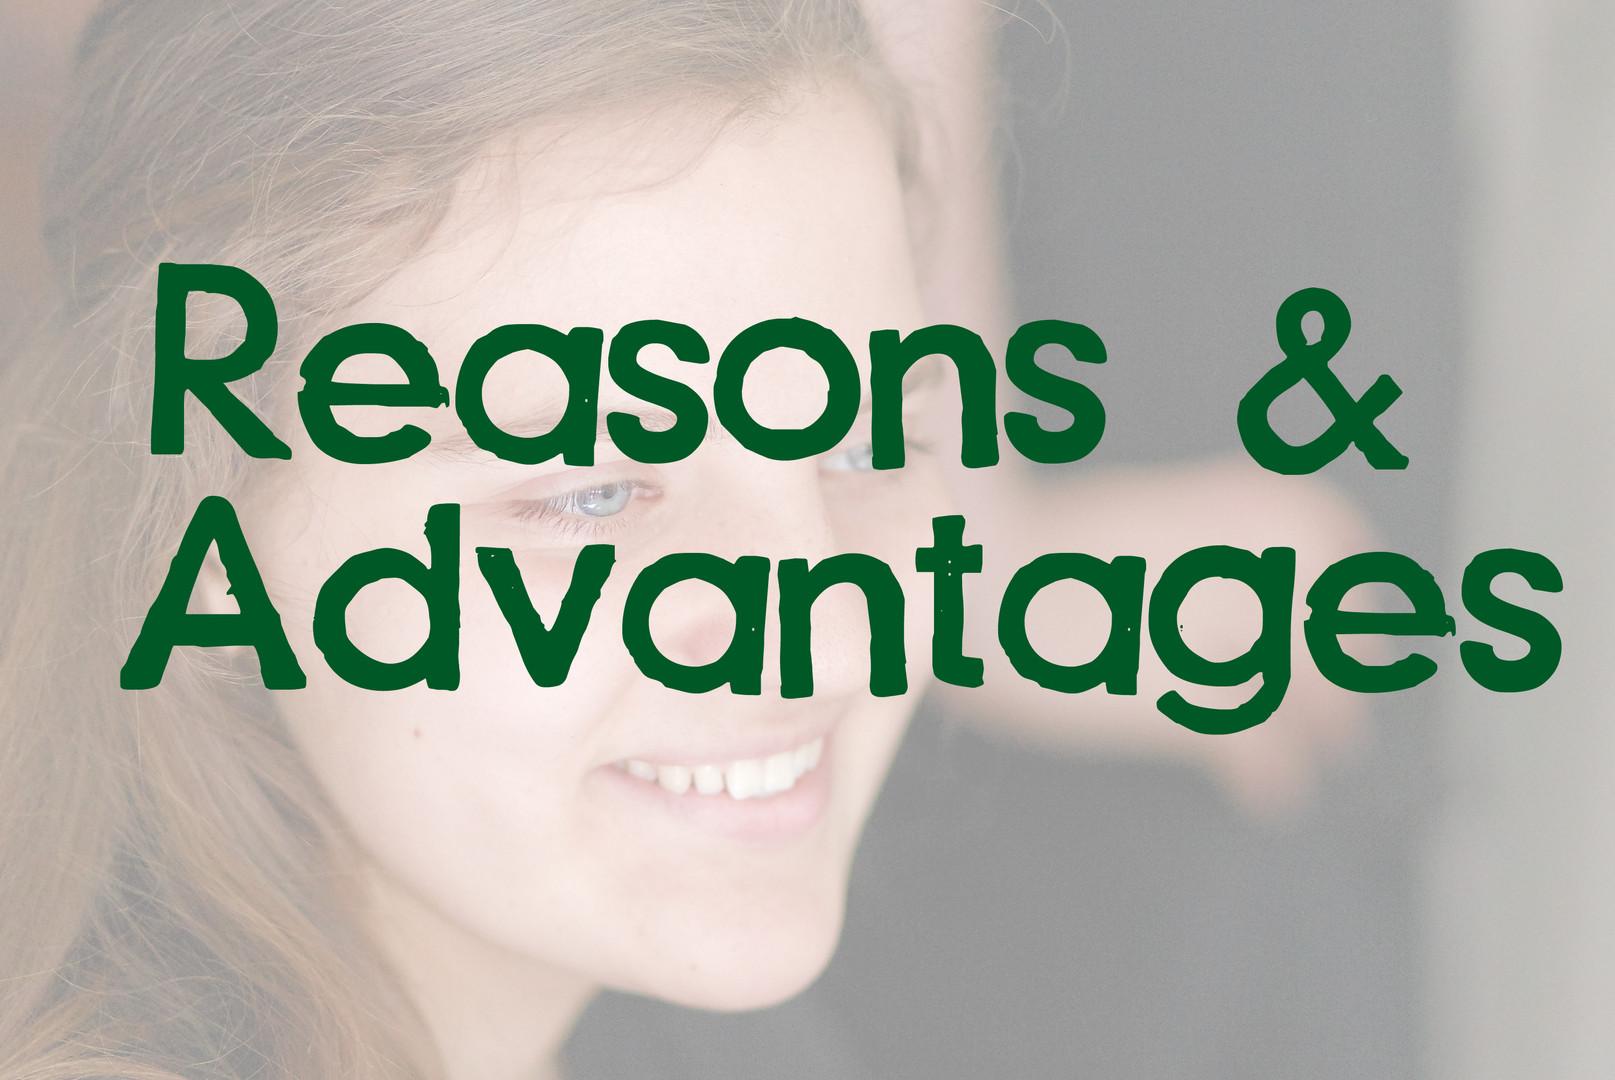 Reasons & Advantages